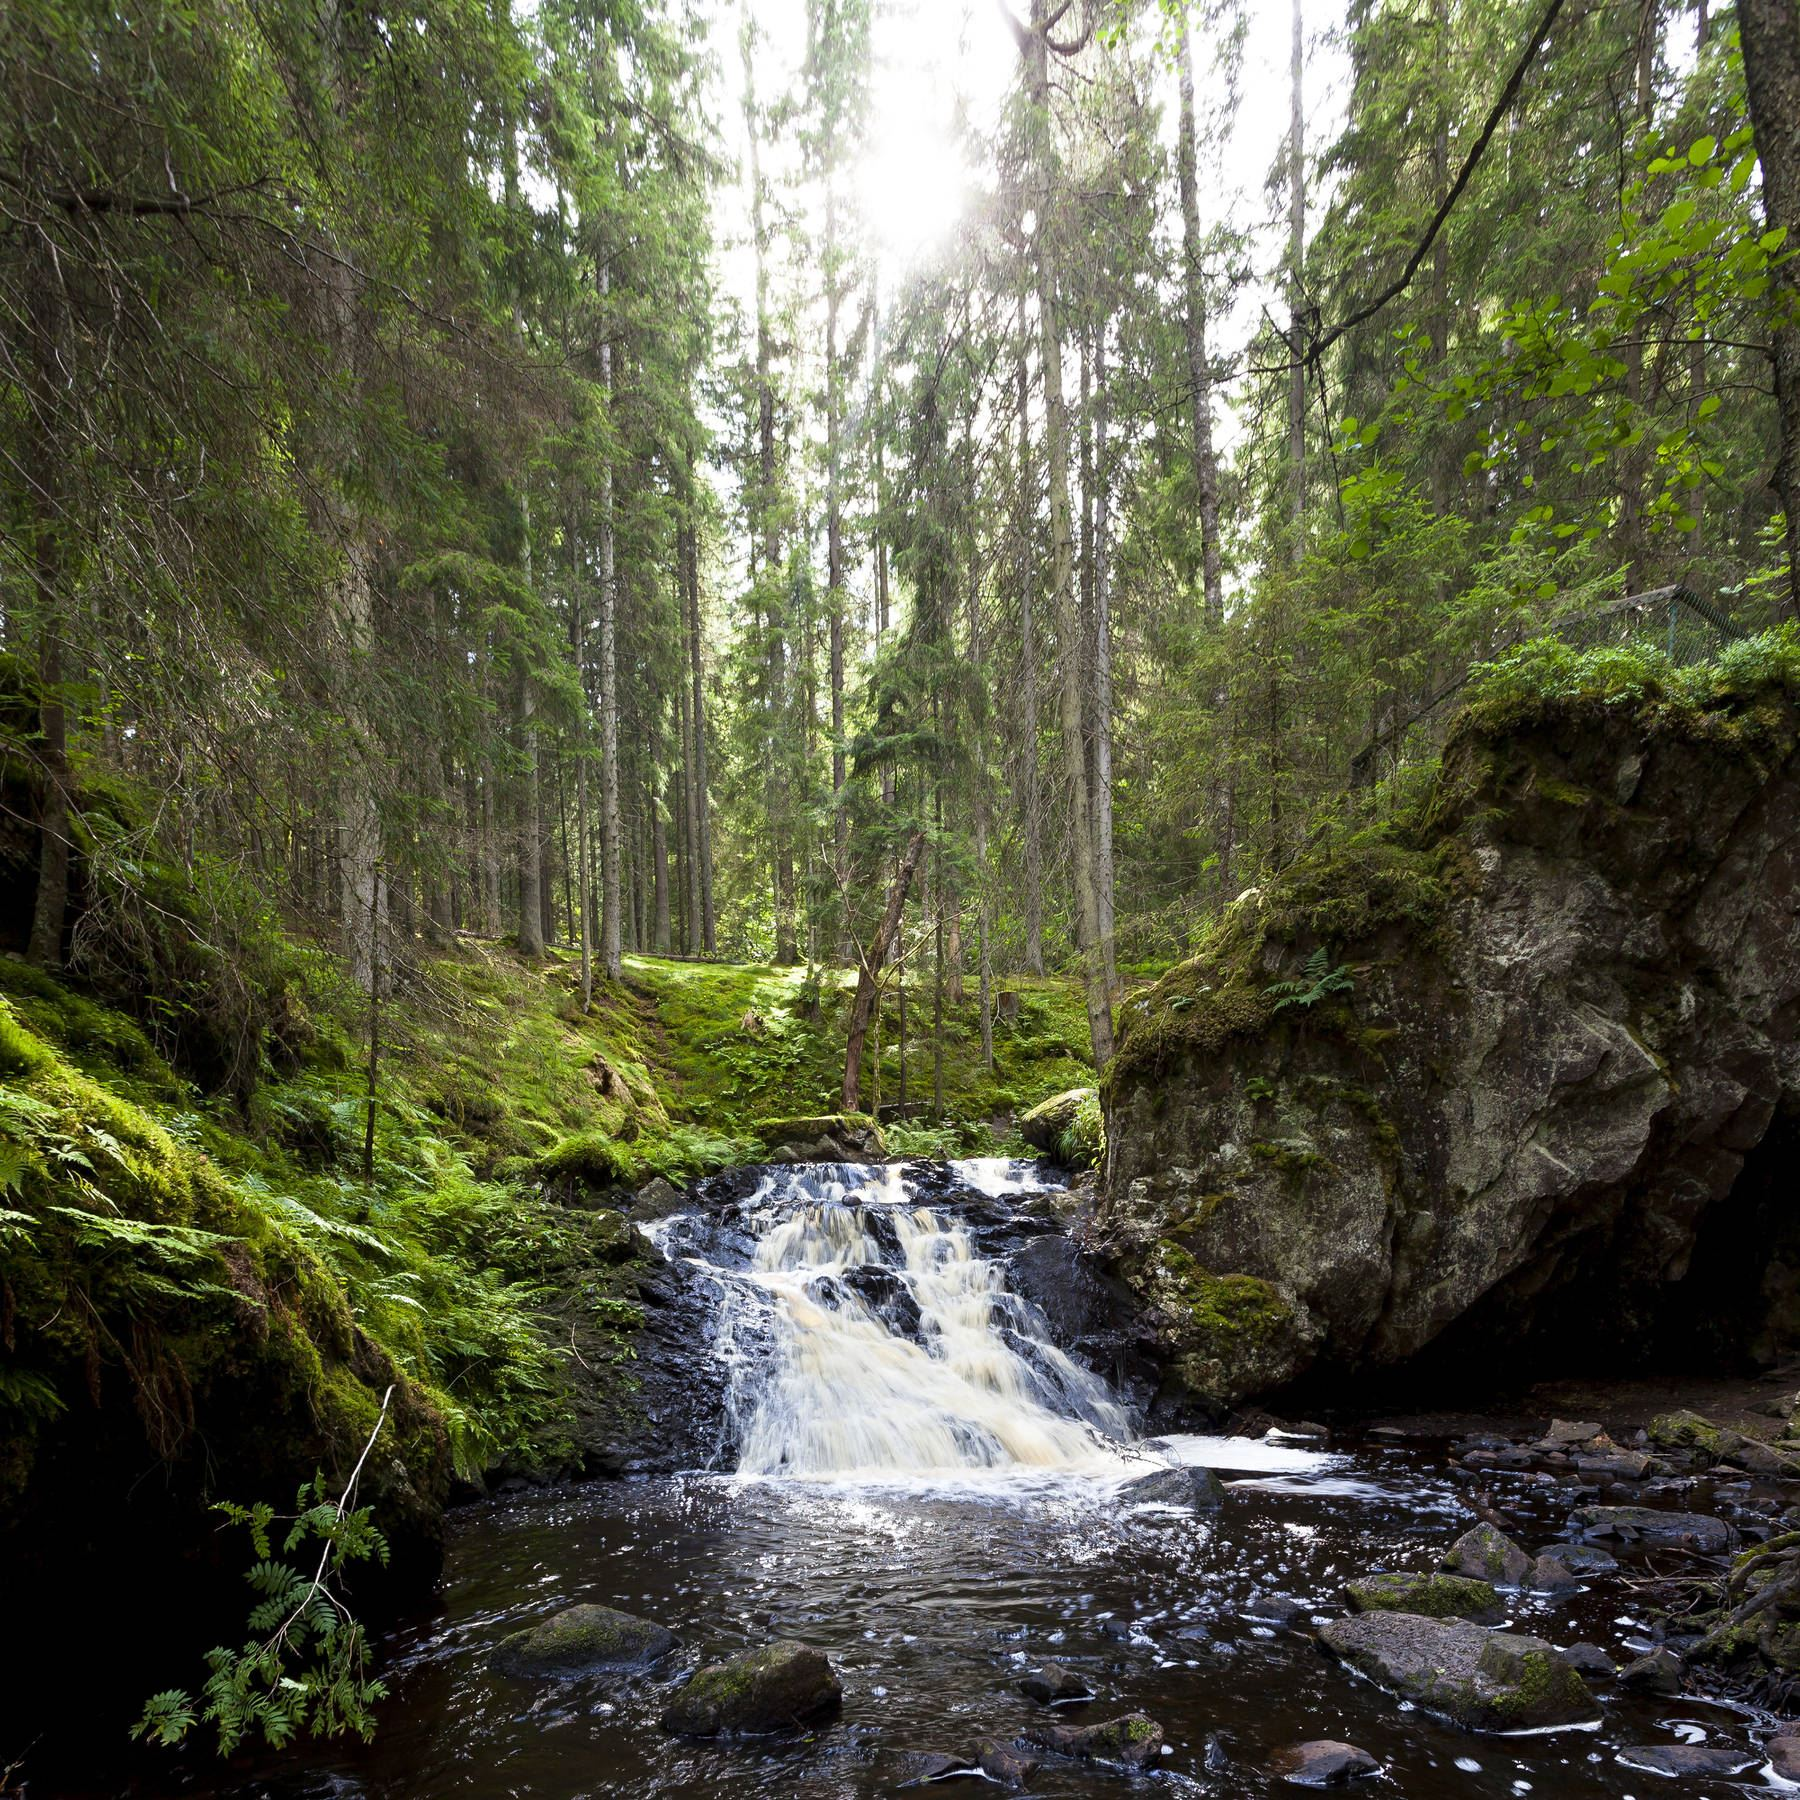 Naturreservat Kronoberg